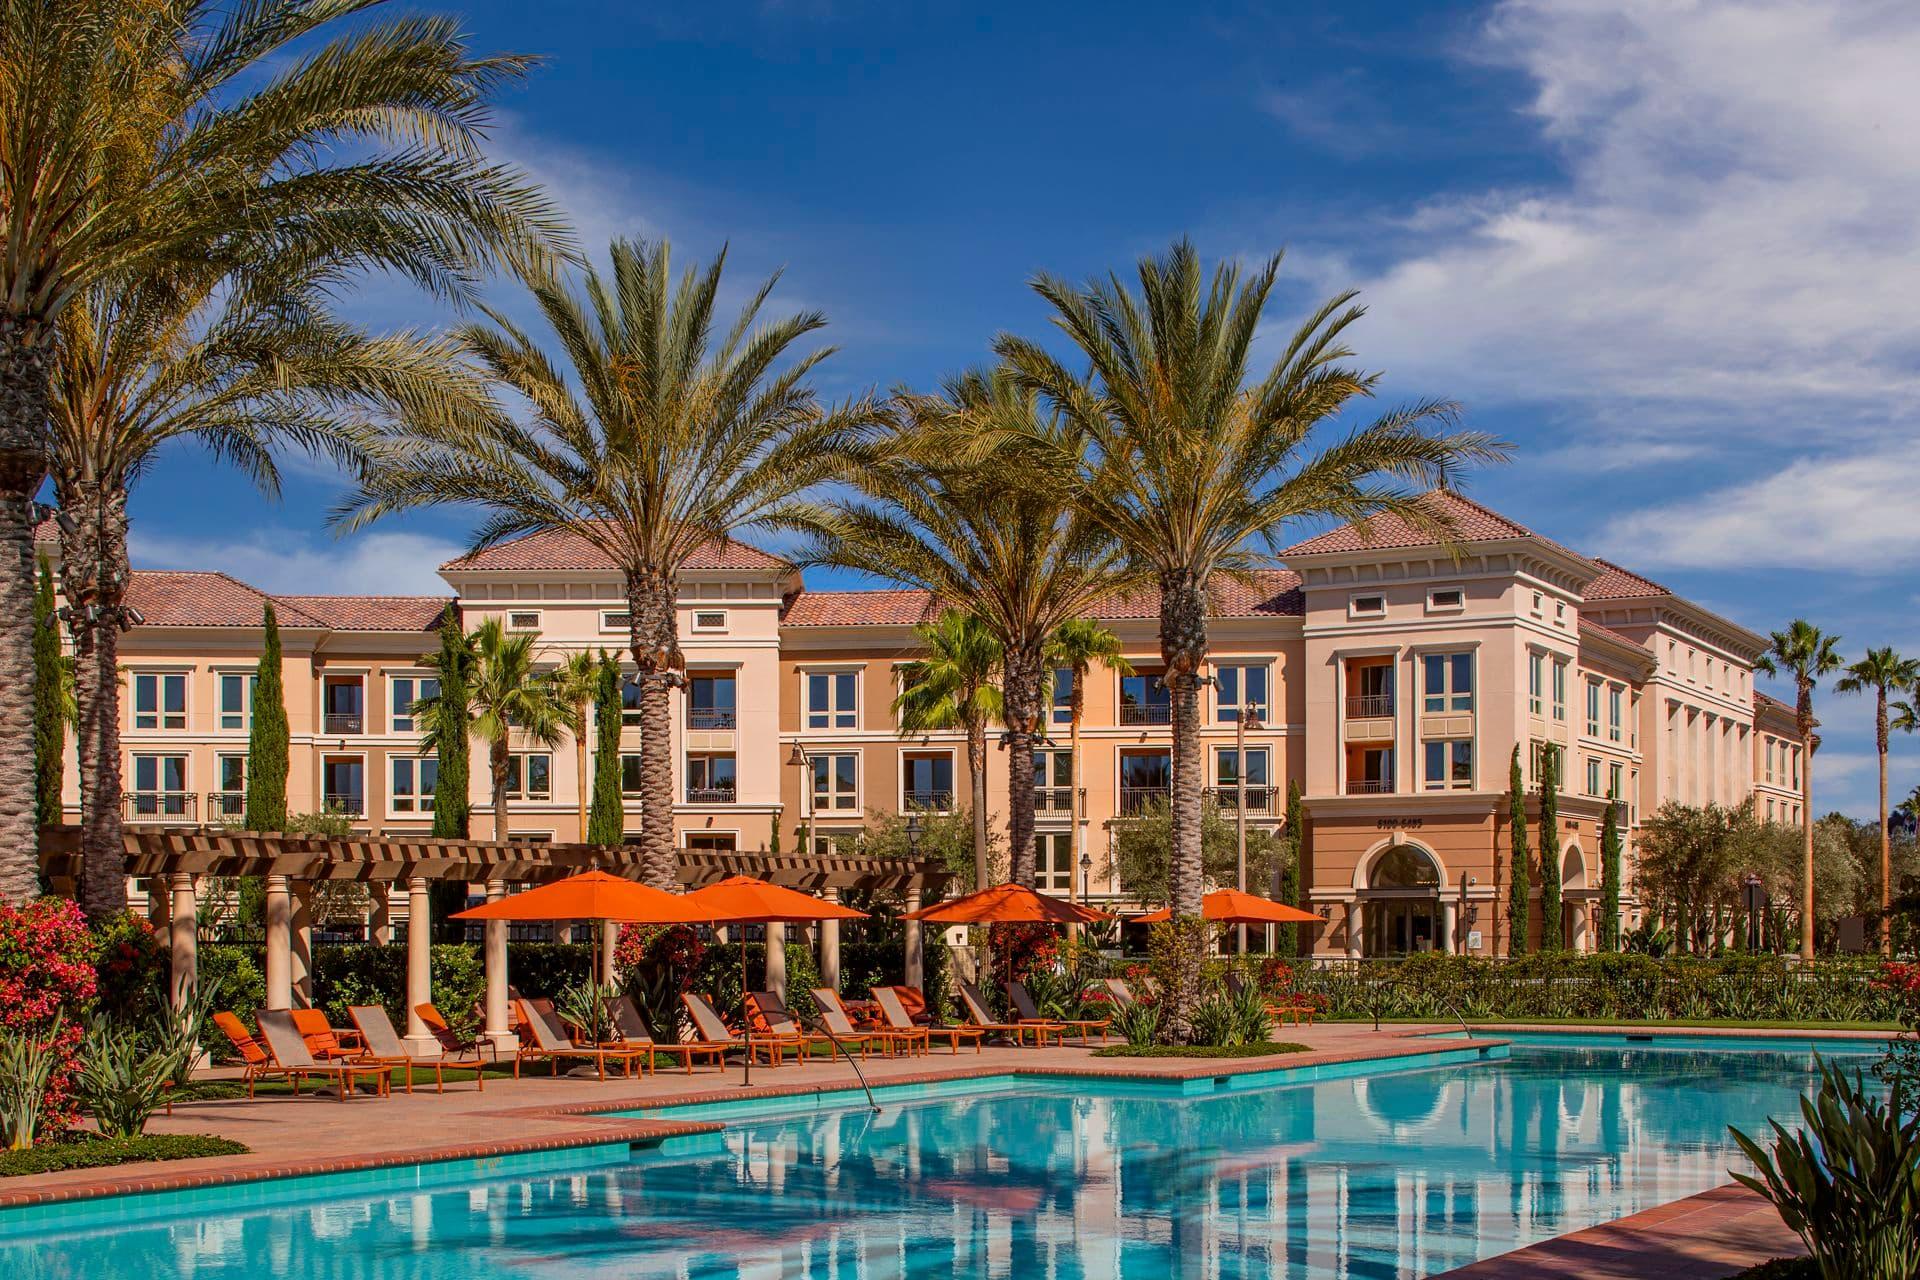 Exterior view of pool at Promenade Apartment Homes in Irvine, CA.